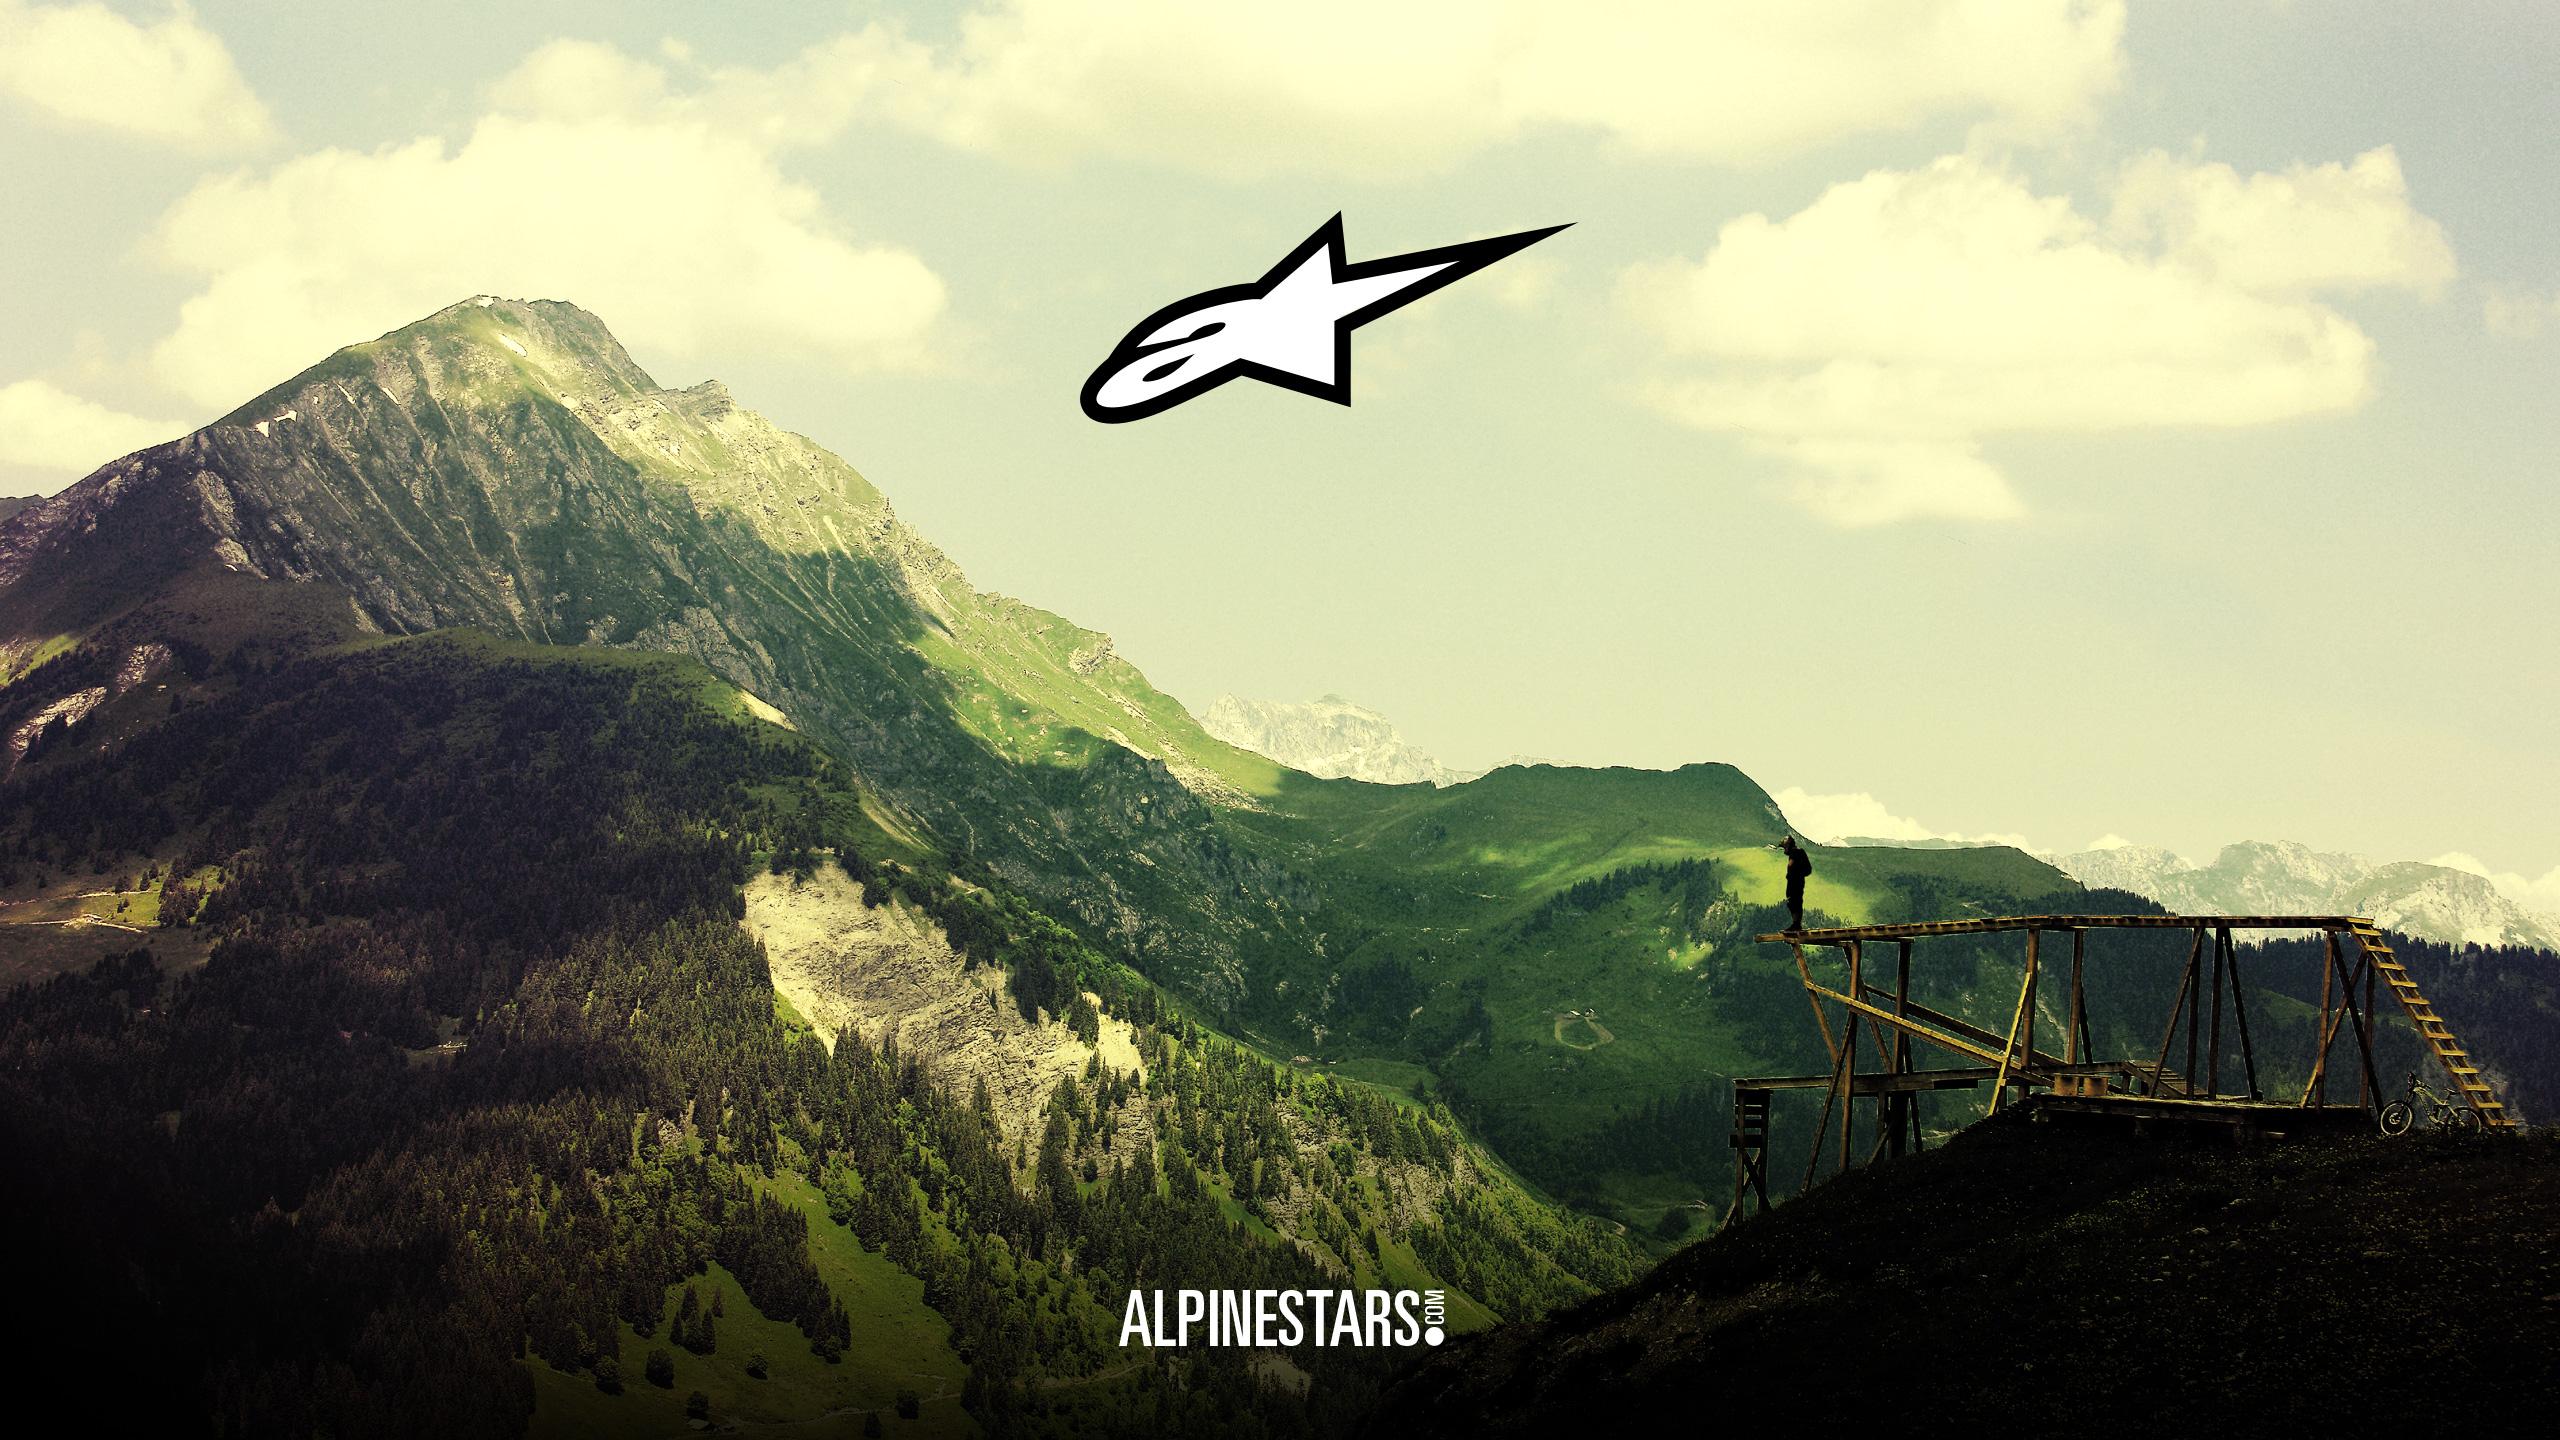 Alpinestar Logo Wallpaper 2560 x 1440 2560x1440